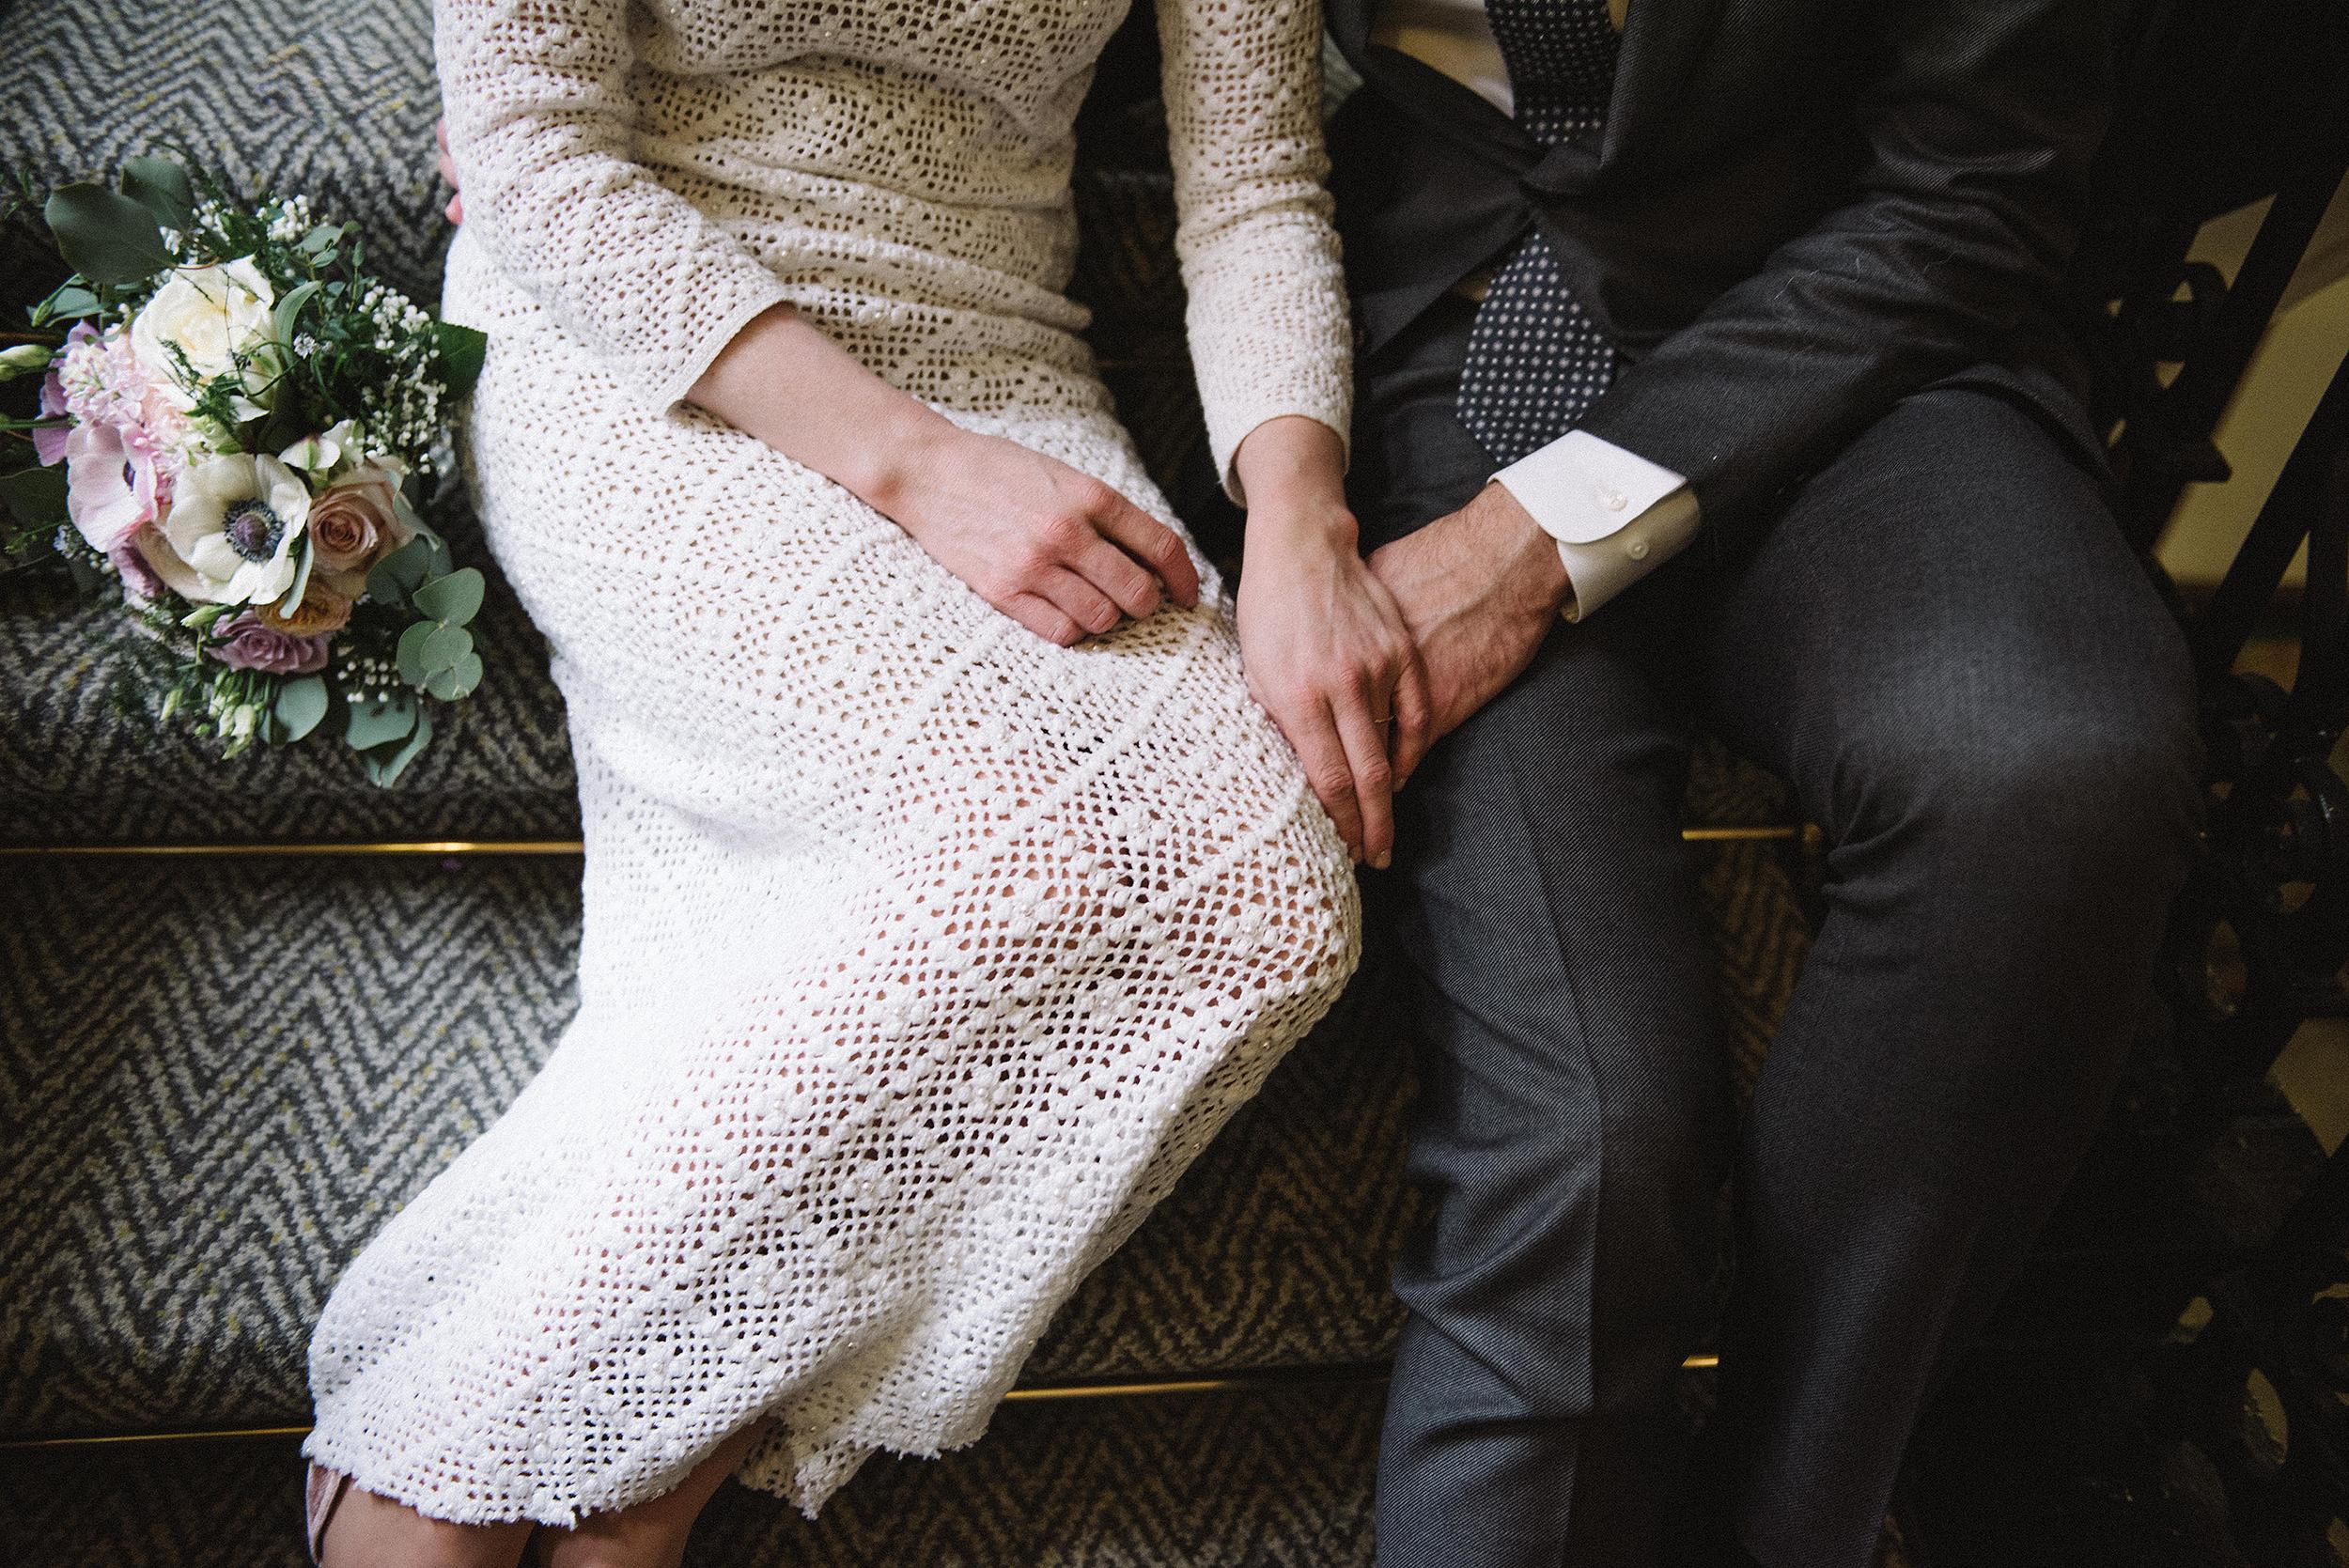 NEW-001-LisaDevine-WeddingFavourites01.jpg